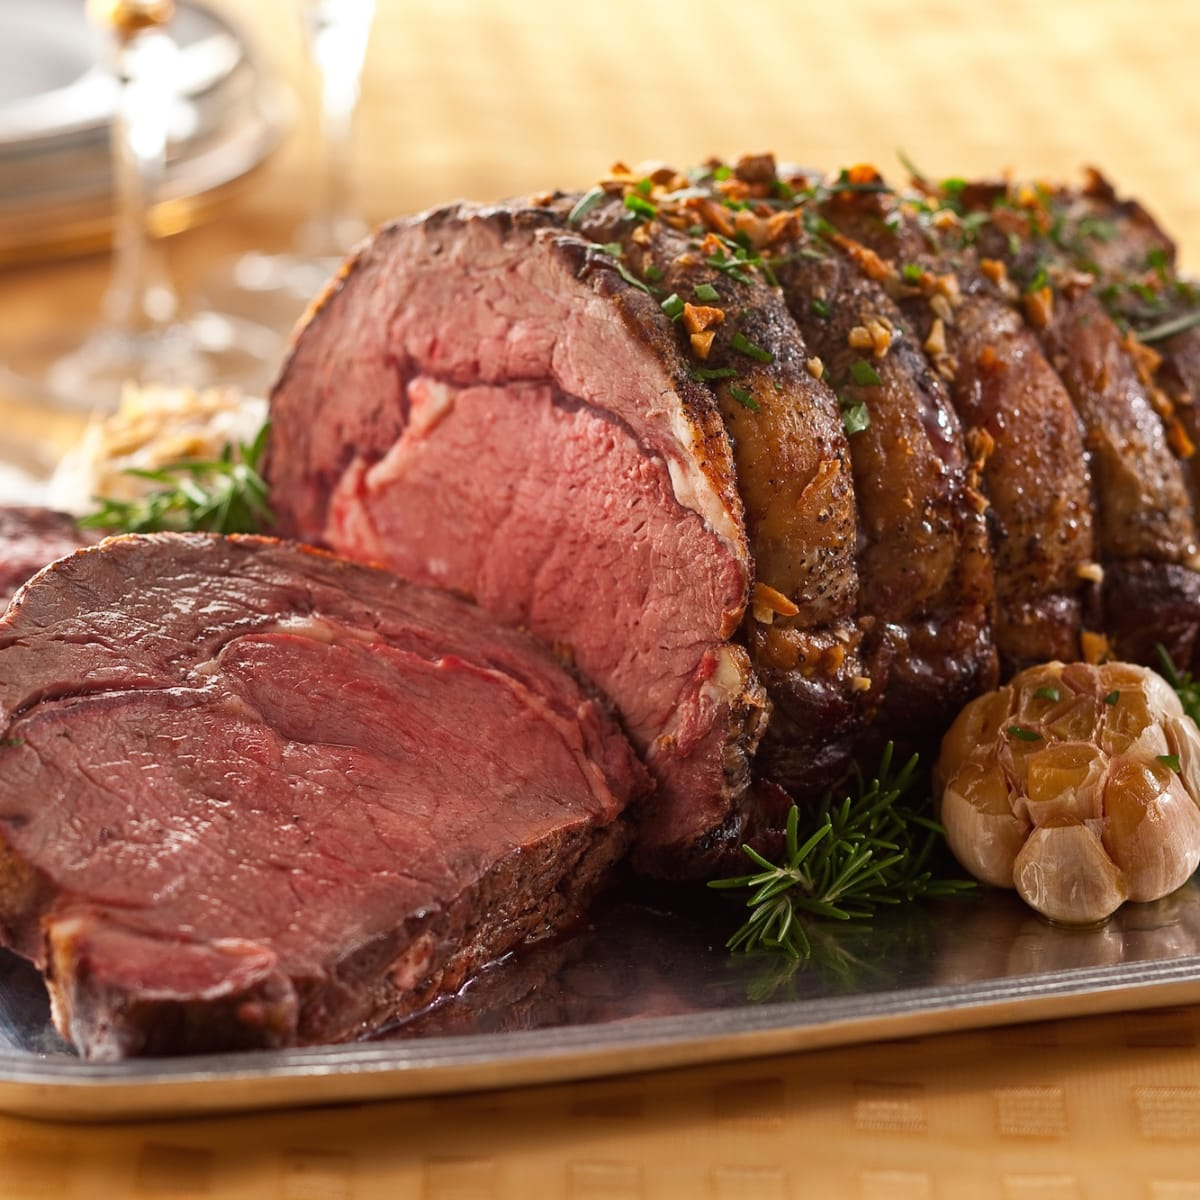 Shoulder Roast With Garlic And Herbs Jamie Geller